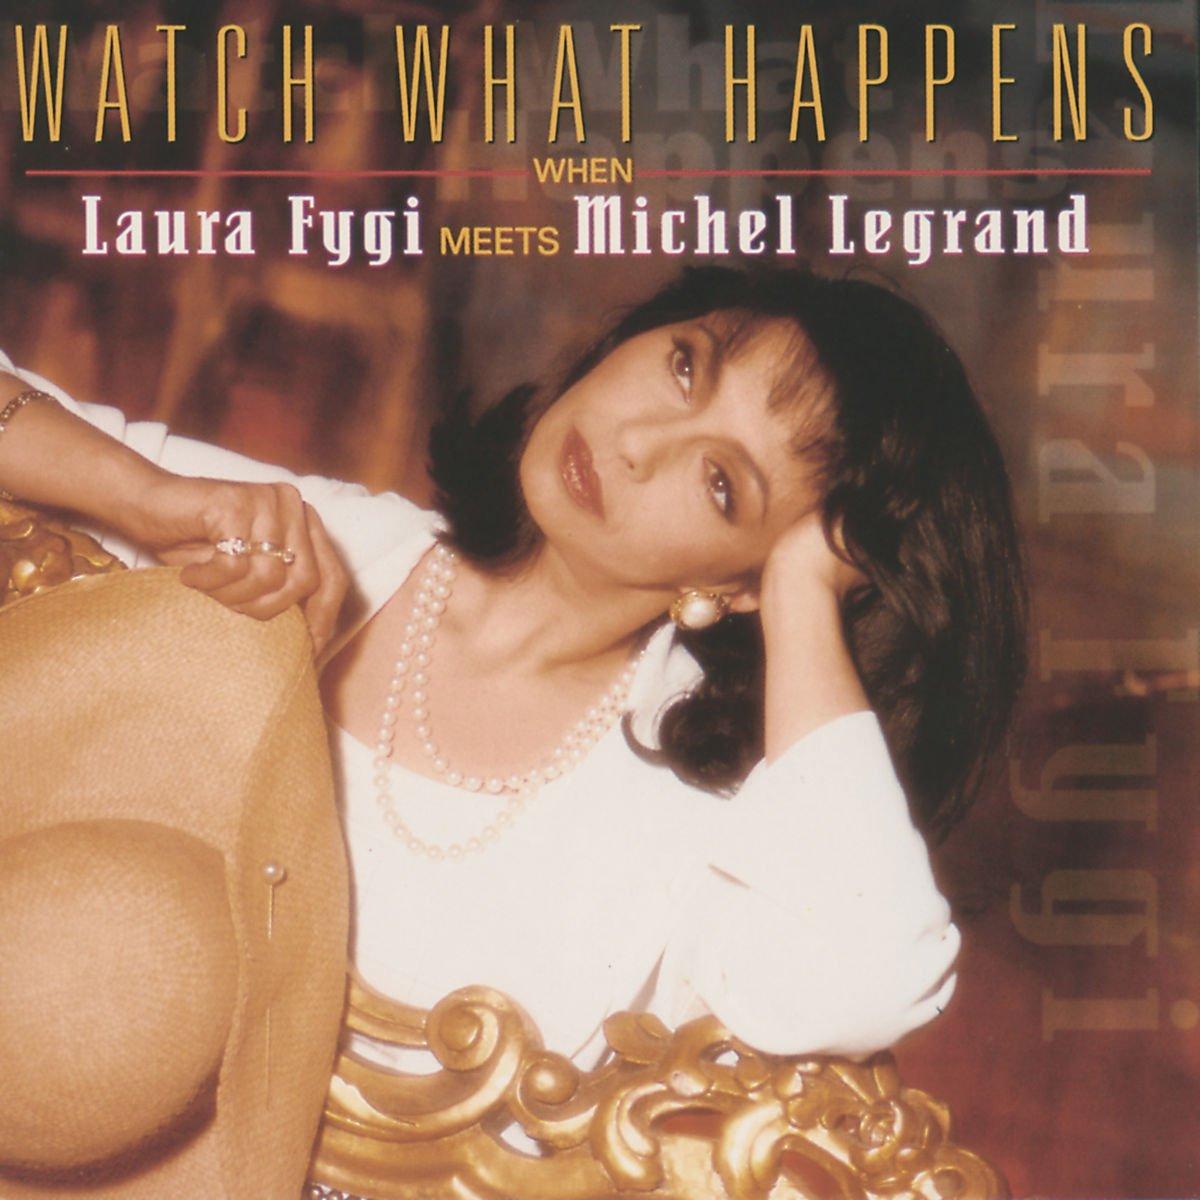 Laura Fygi - Watch What Happens When Laura Fygi Meets Michel ...